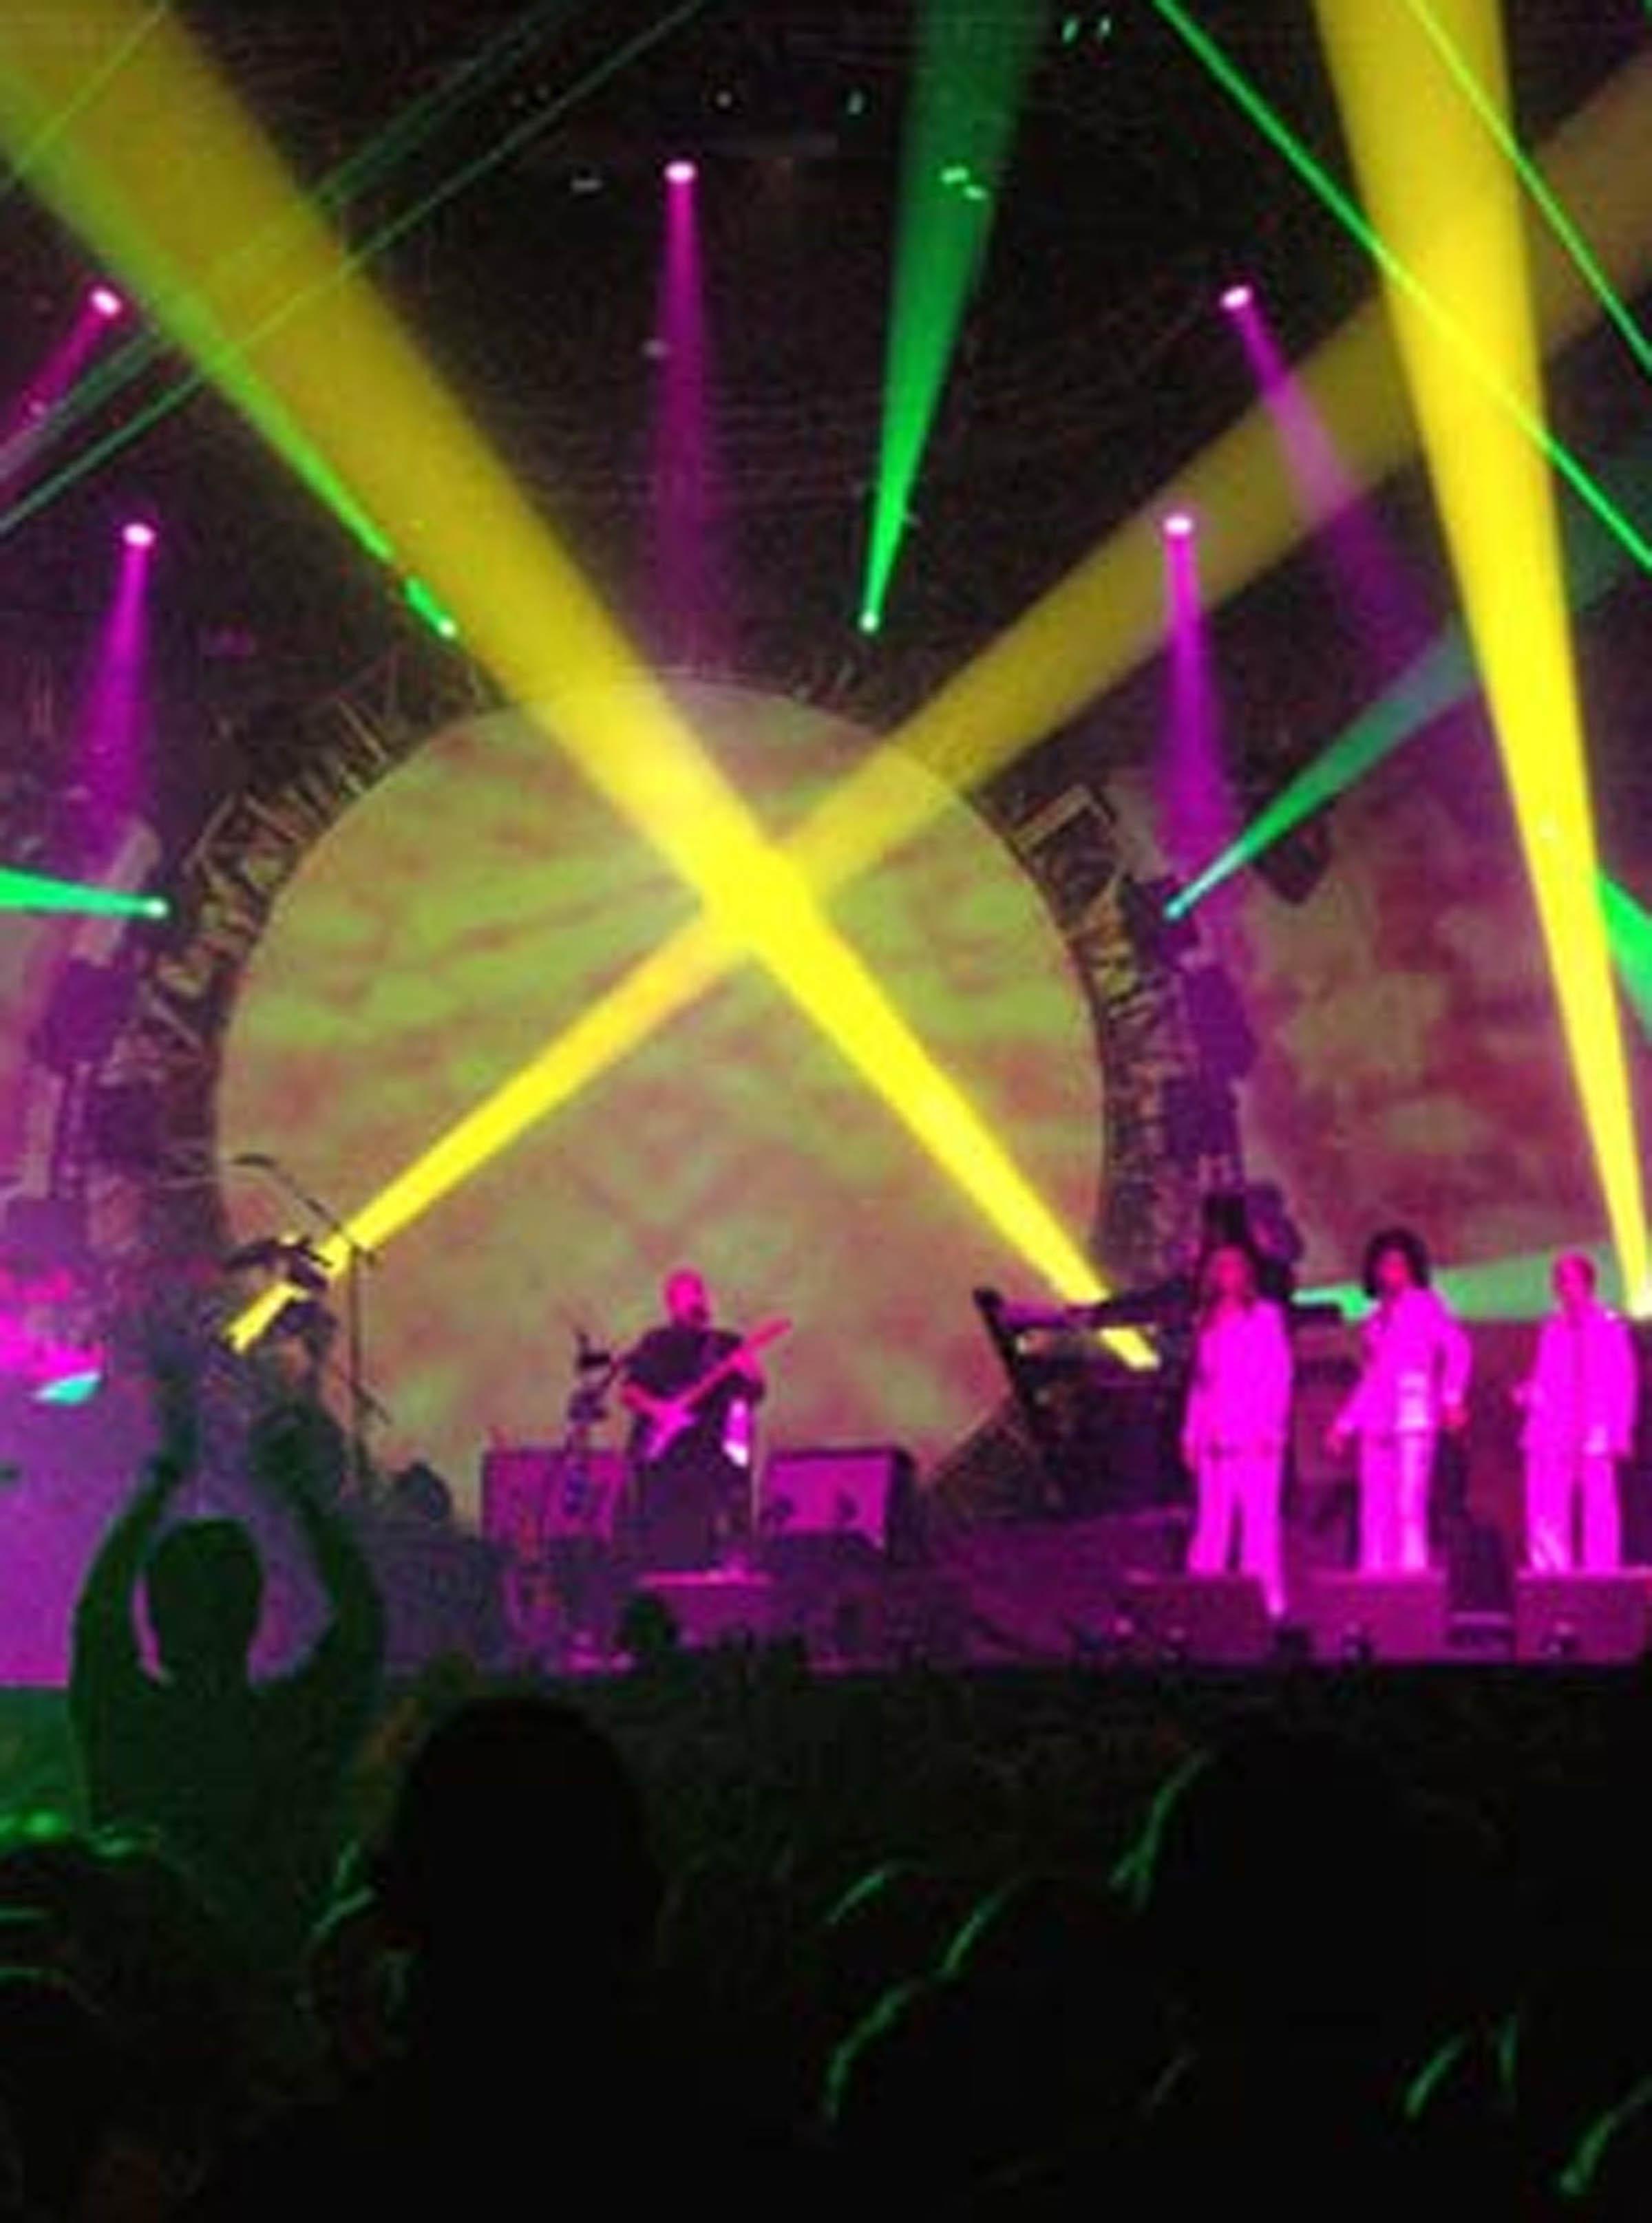 Pink concert dates in Sydney